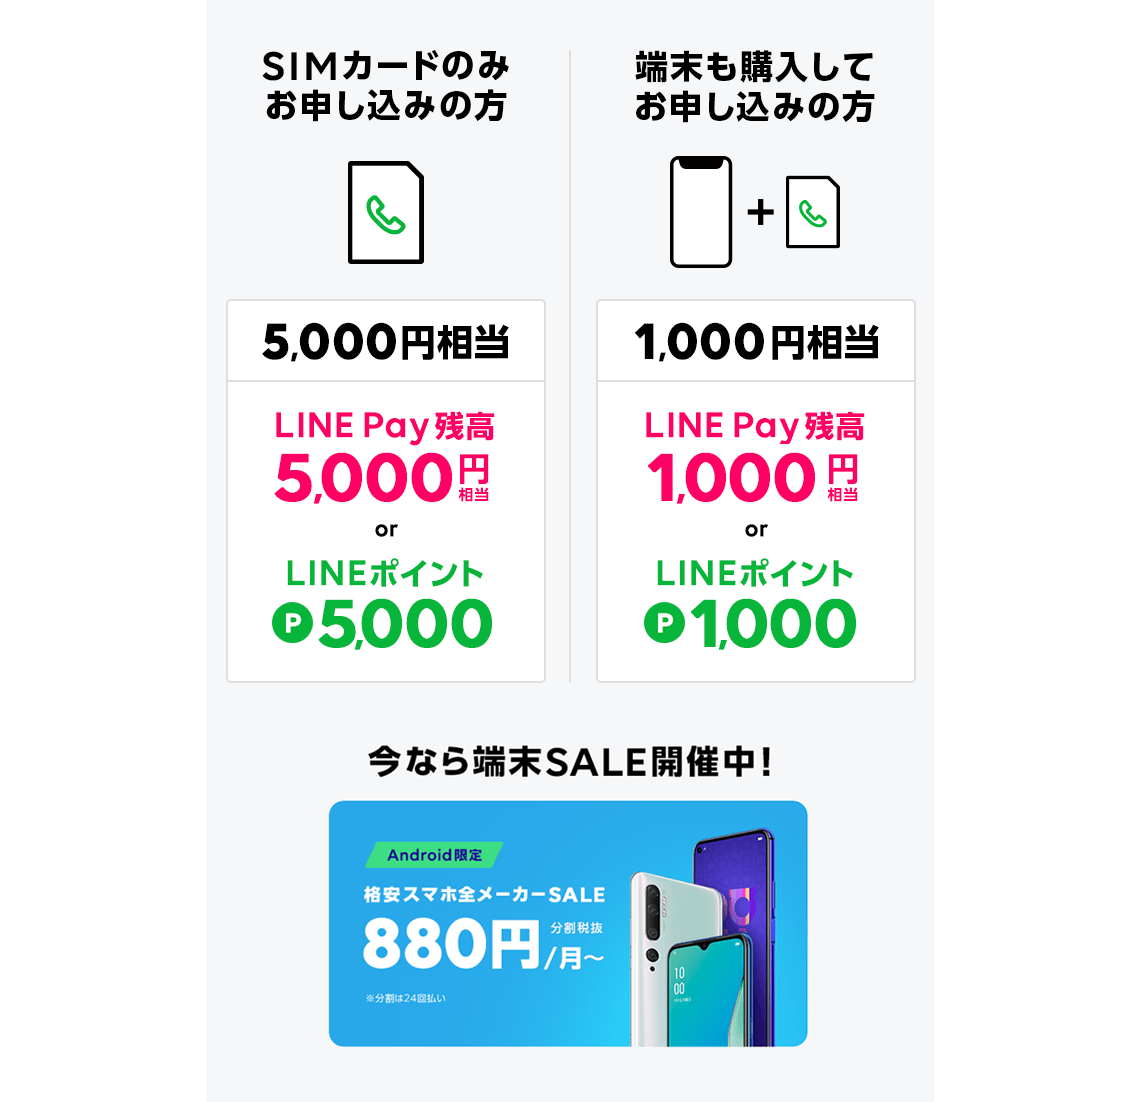 SIMカードのみお申し込みの方5,000円相当 端末も購入してお申し込みの方1,000円相当 今なら端末SALE開催中